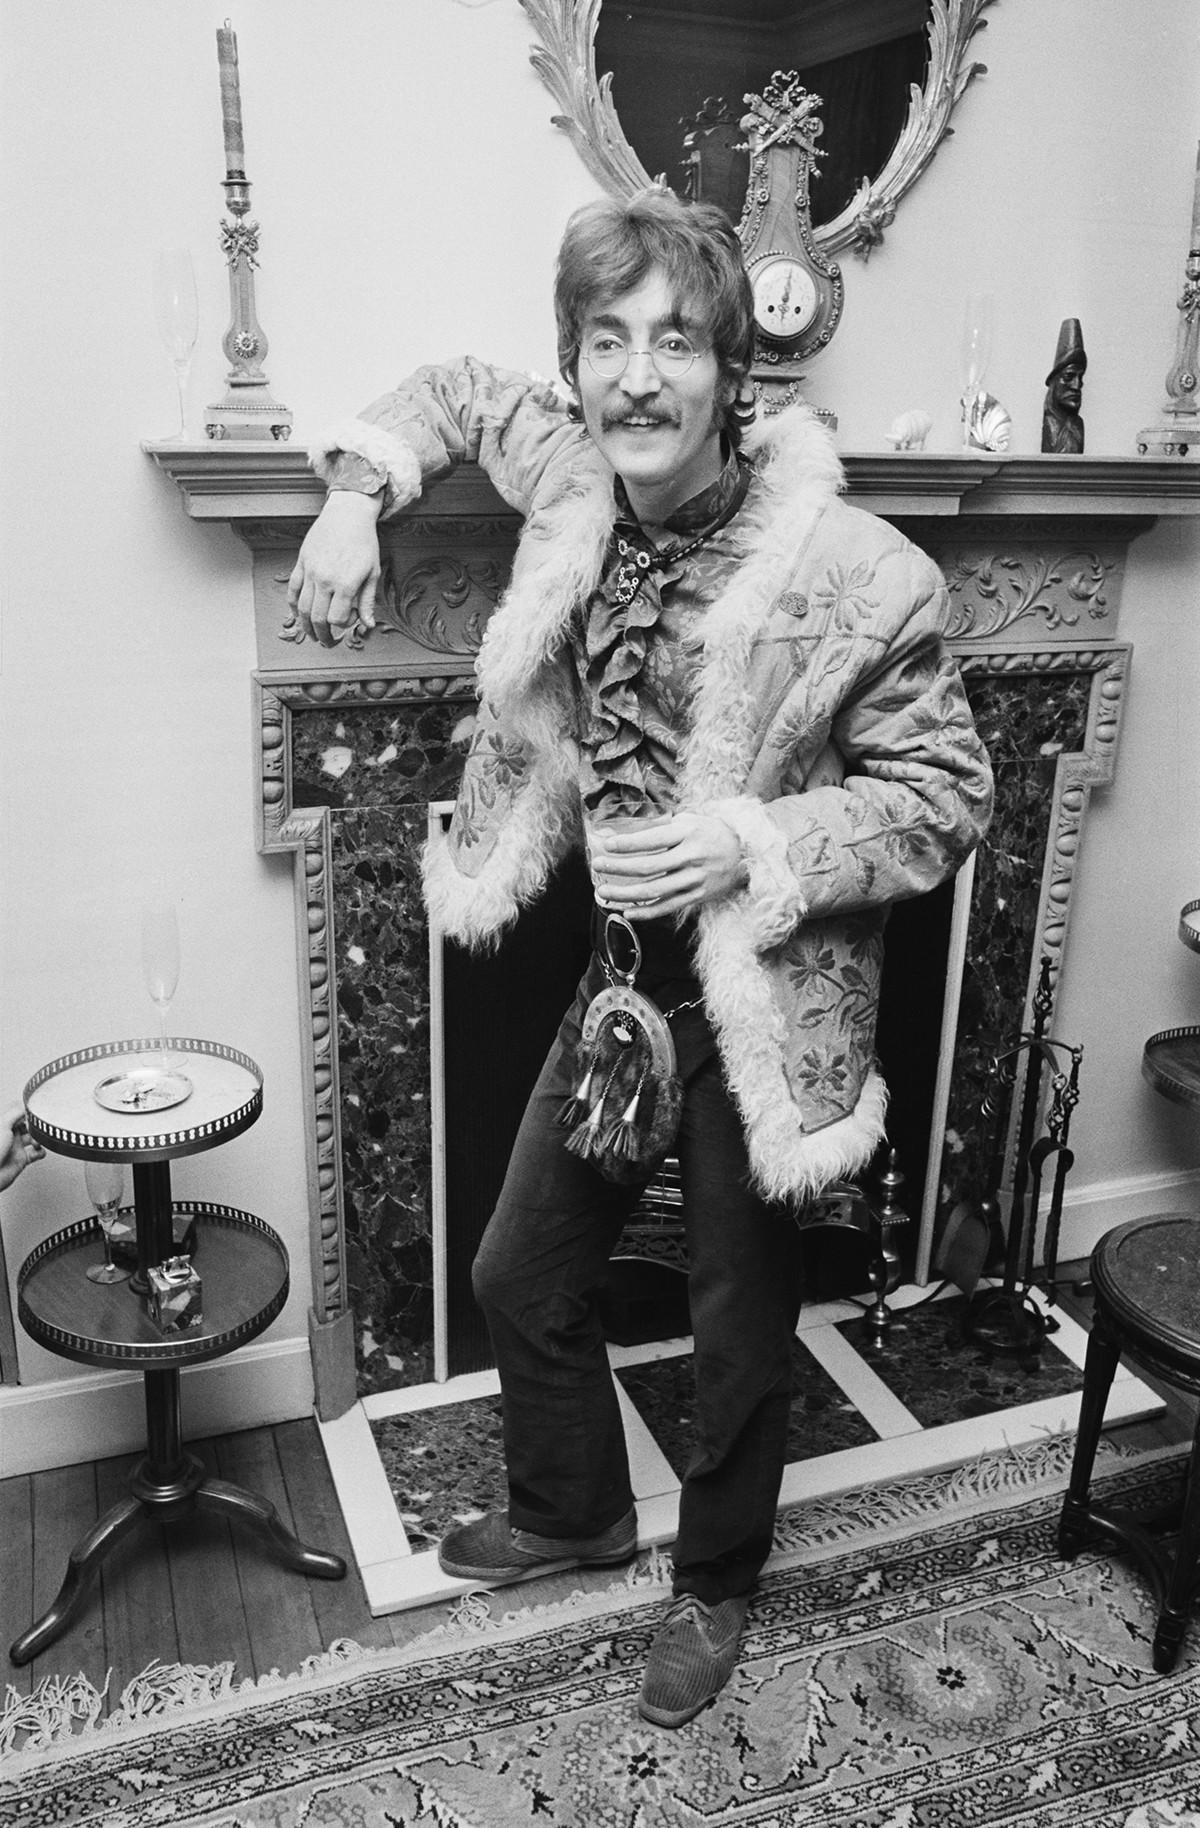 John Lennon in einem Schaffellmantel